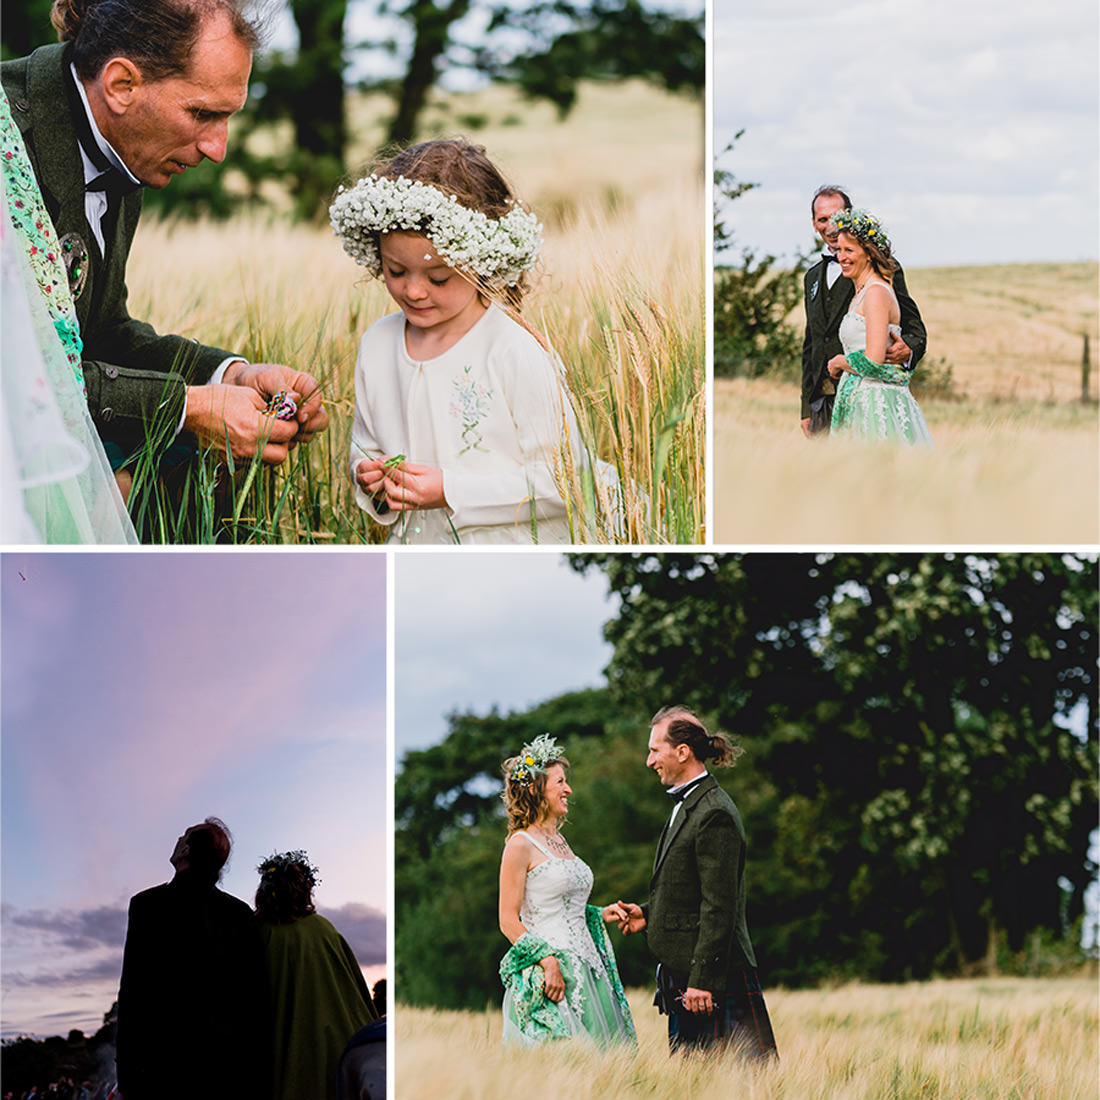 Image: Chesterfield wedding